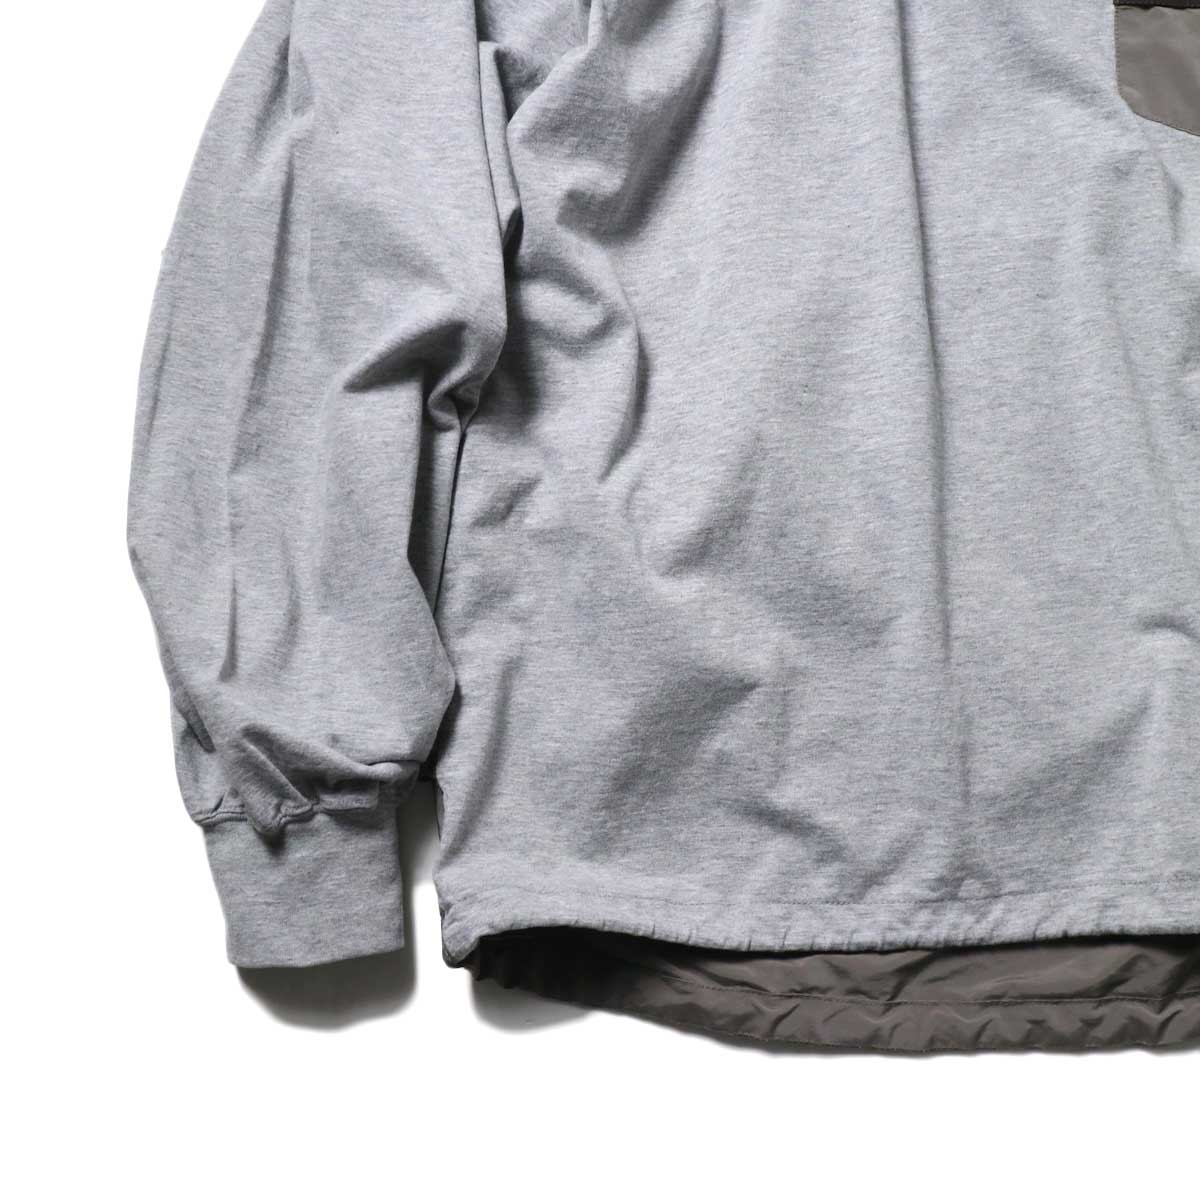 REMI RELIEF / ブリーフィング 30/天竺ベンチレーションロンT (Gray)袖、裾